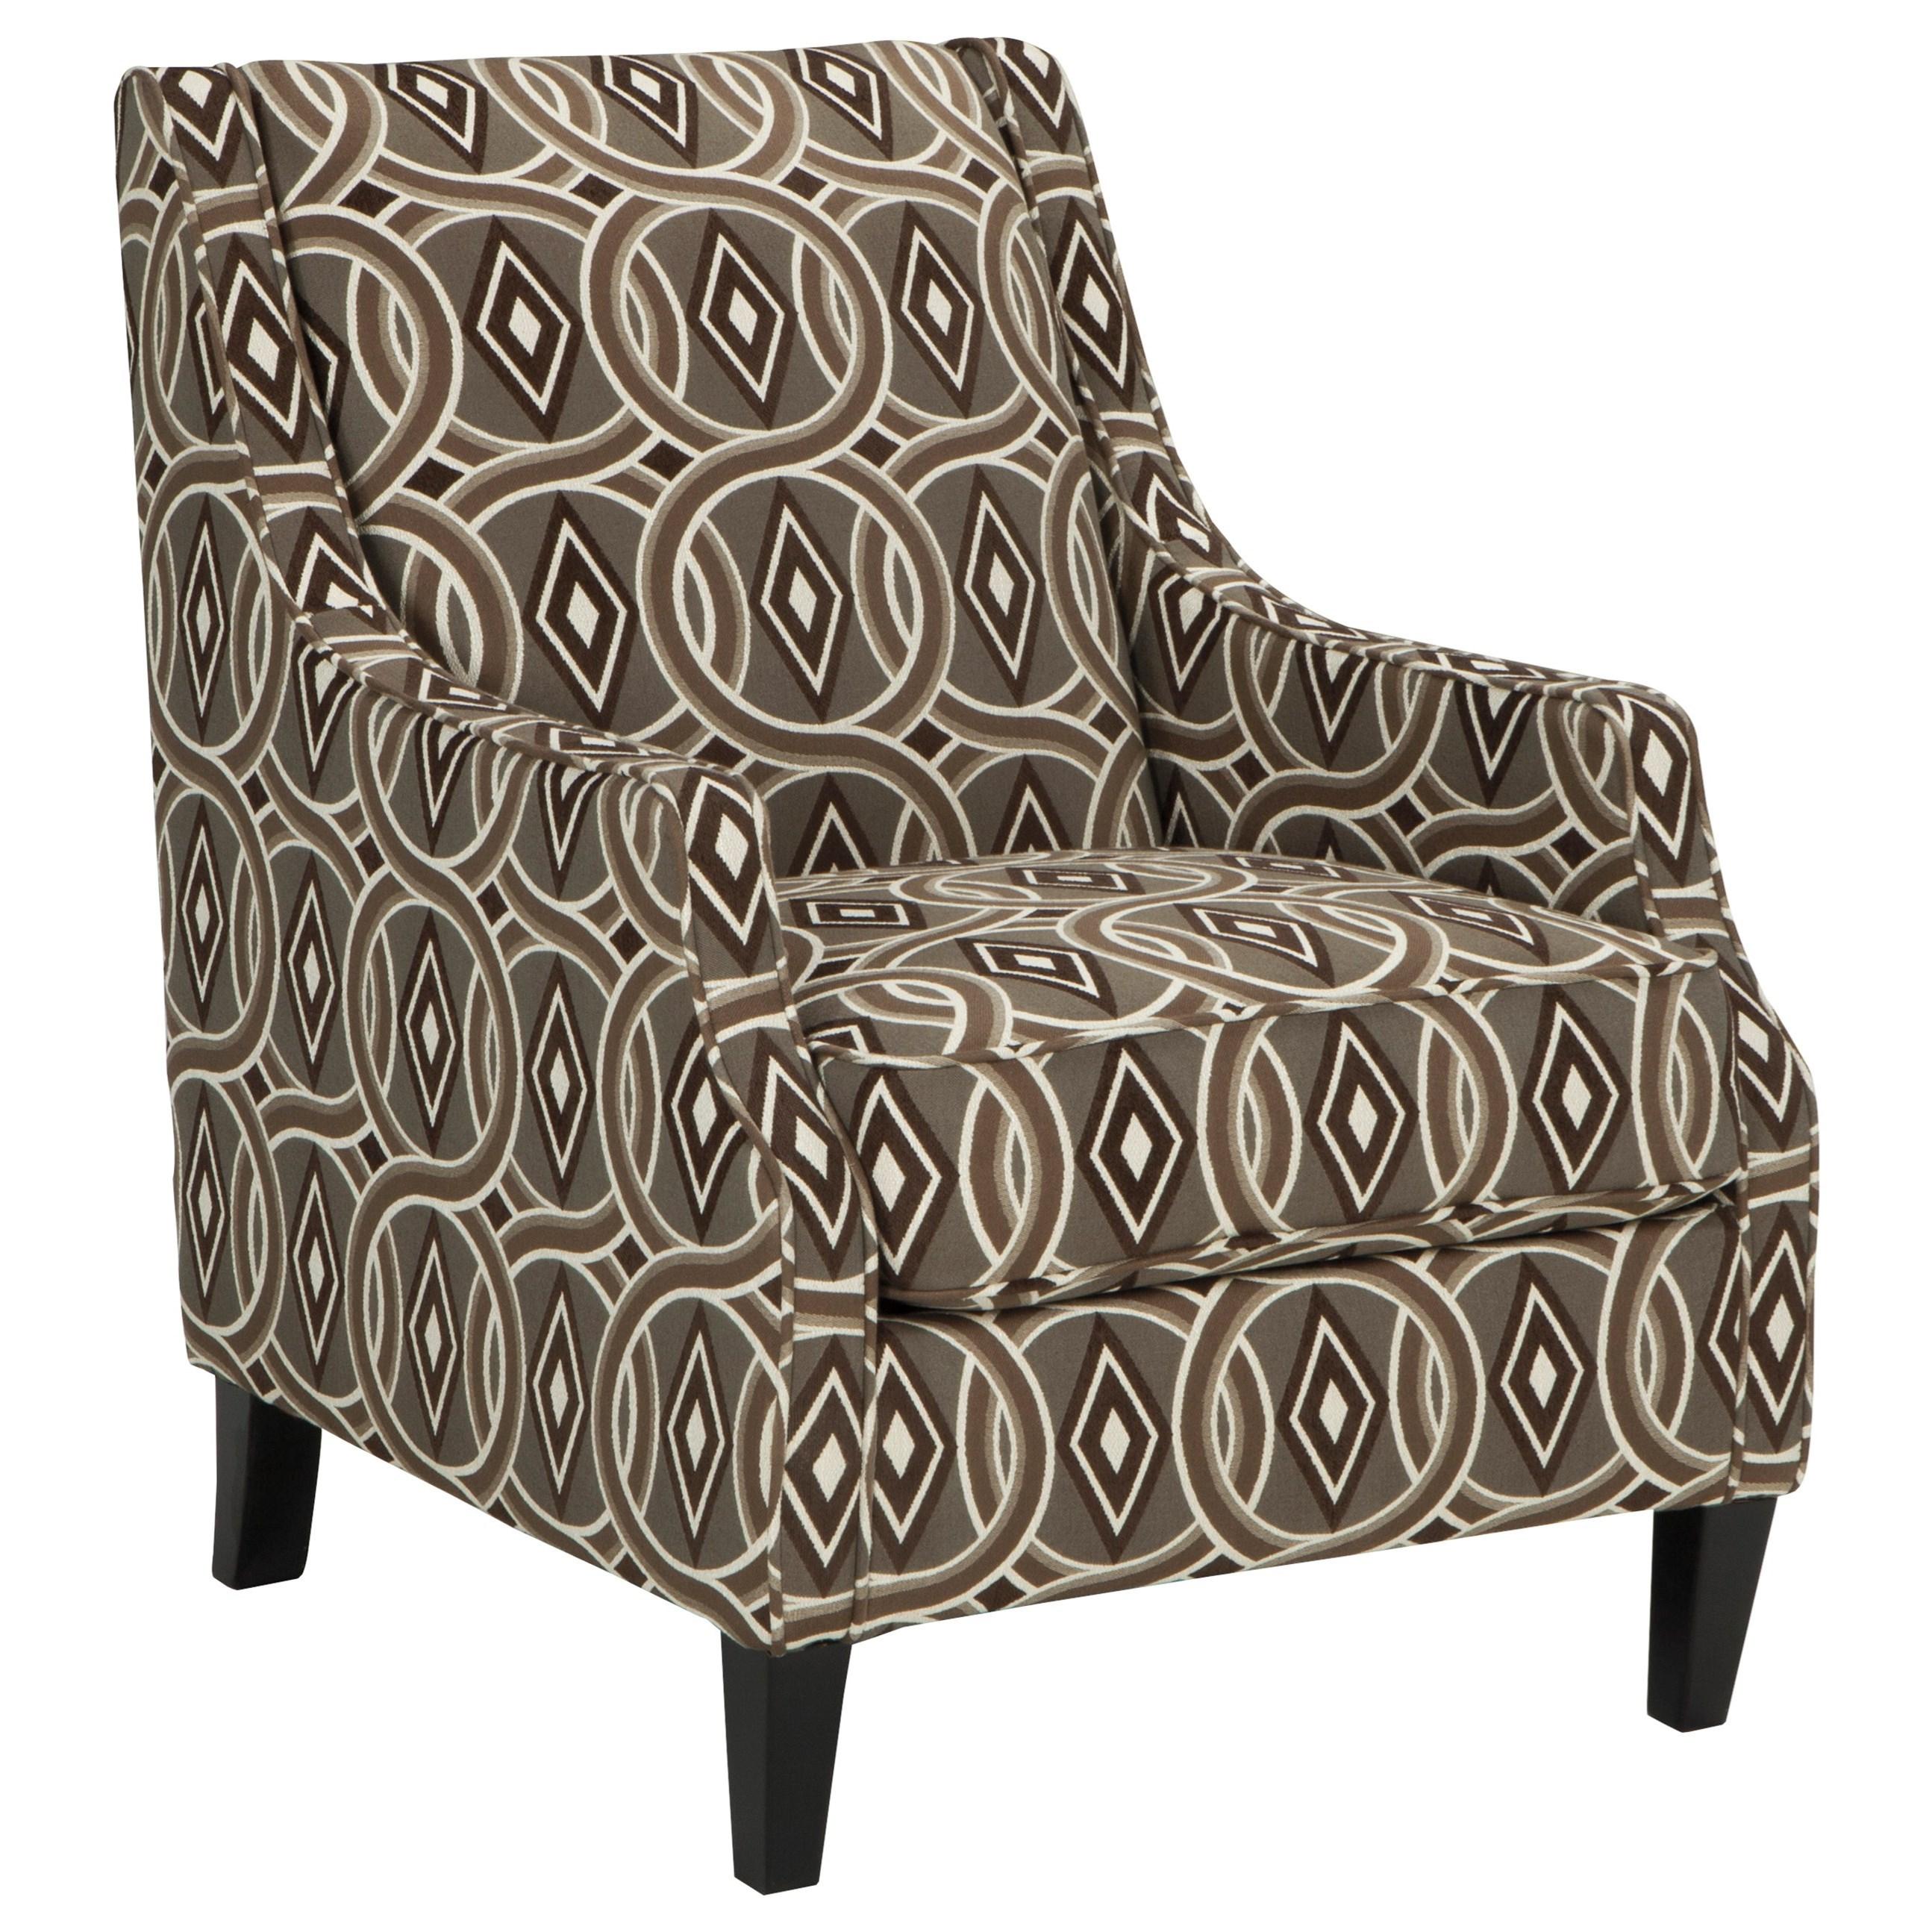 Bernat Accent Chair by Ashley Furniture at Lapeer Furniture & Mattress Center